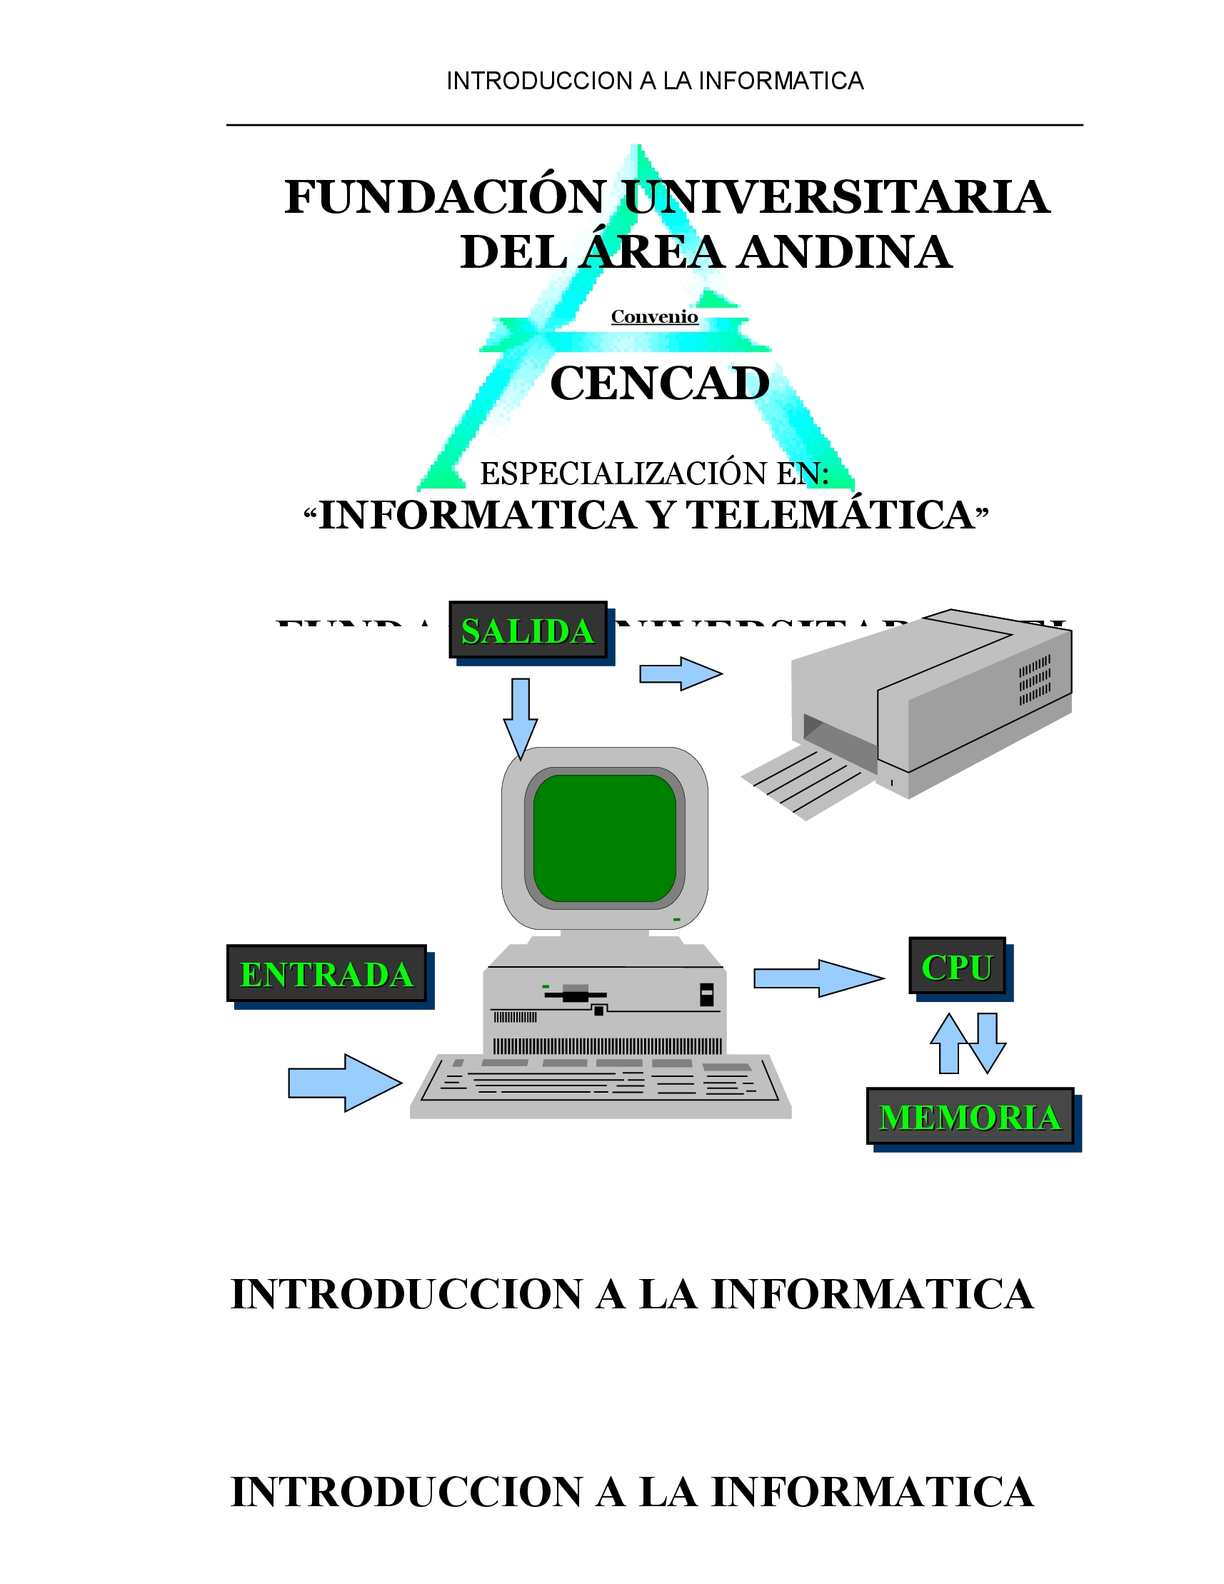 Calaméo - introducción a la informática